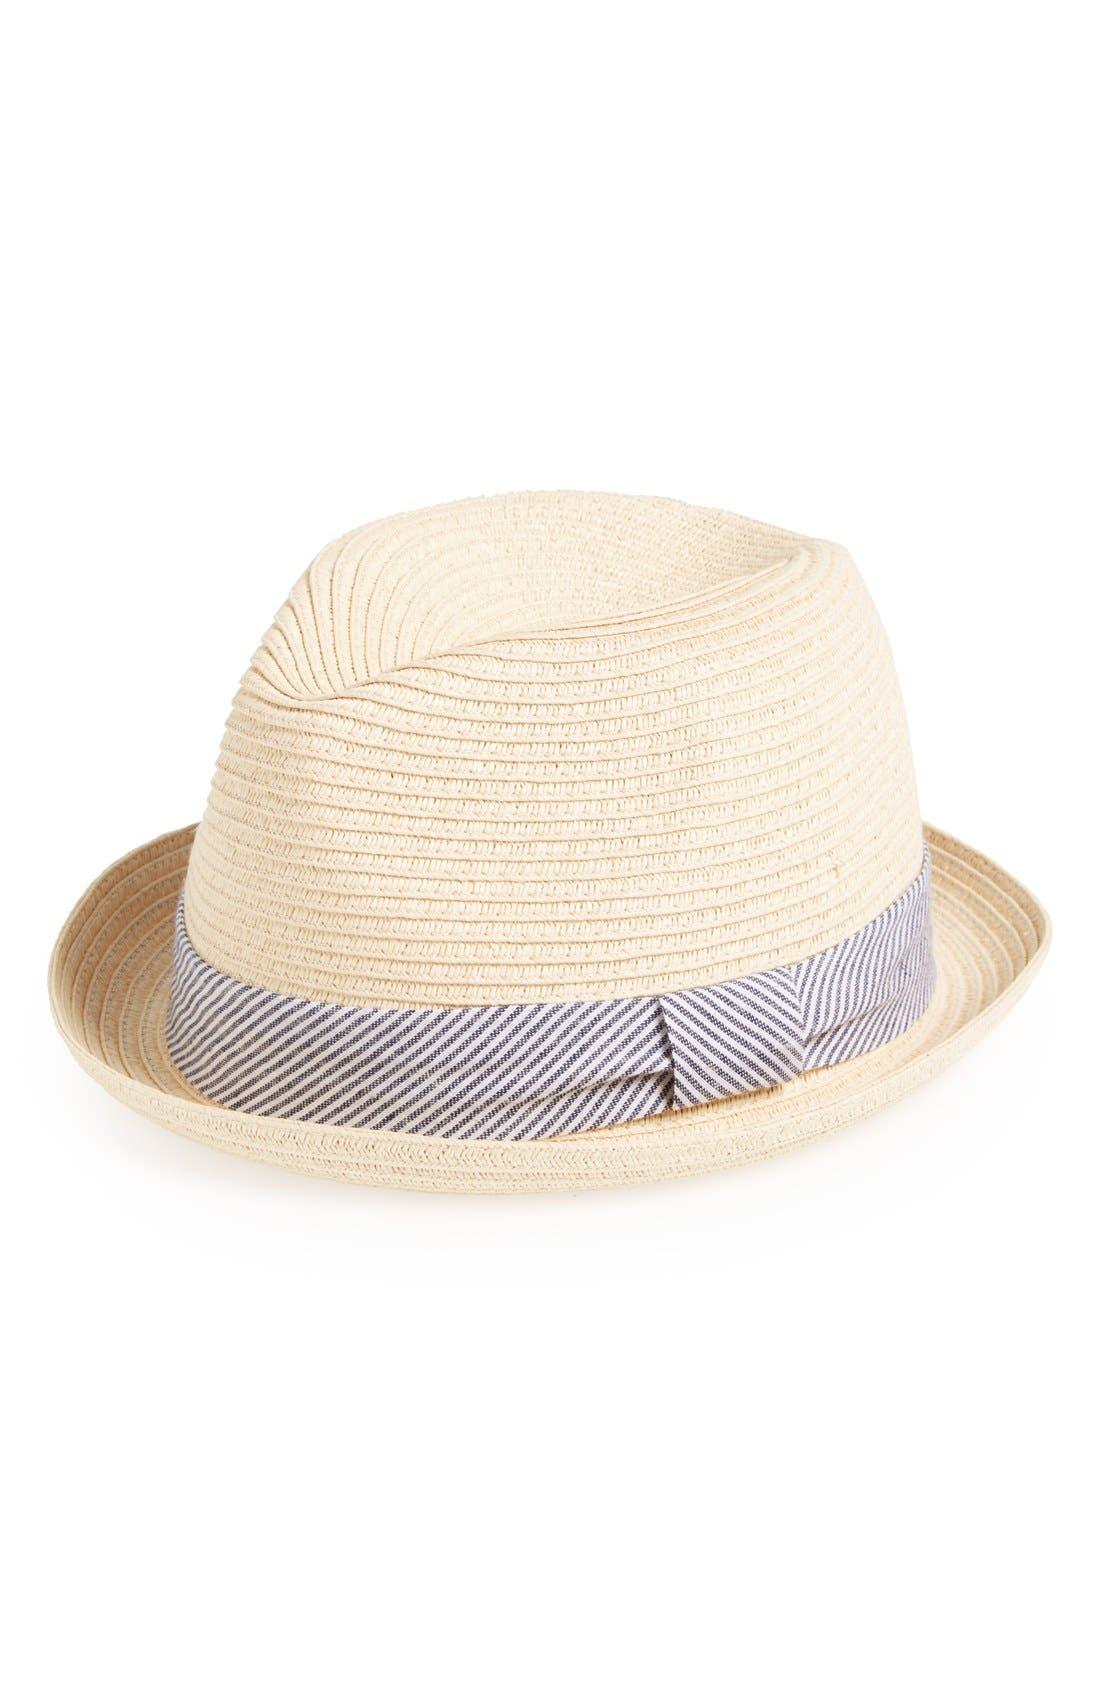 Alternate Image 1 Selected - Glory Hats by Goorin 'Fireball' Straw Fedora